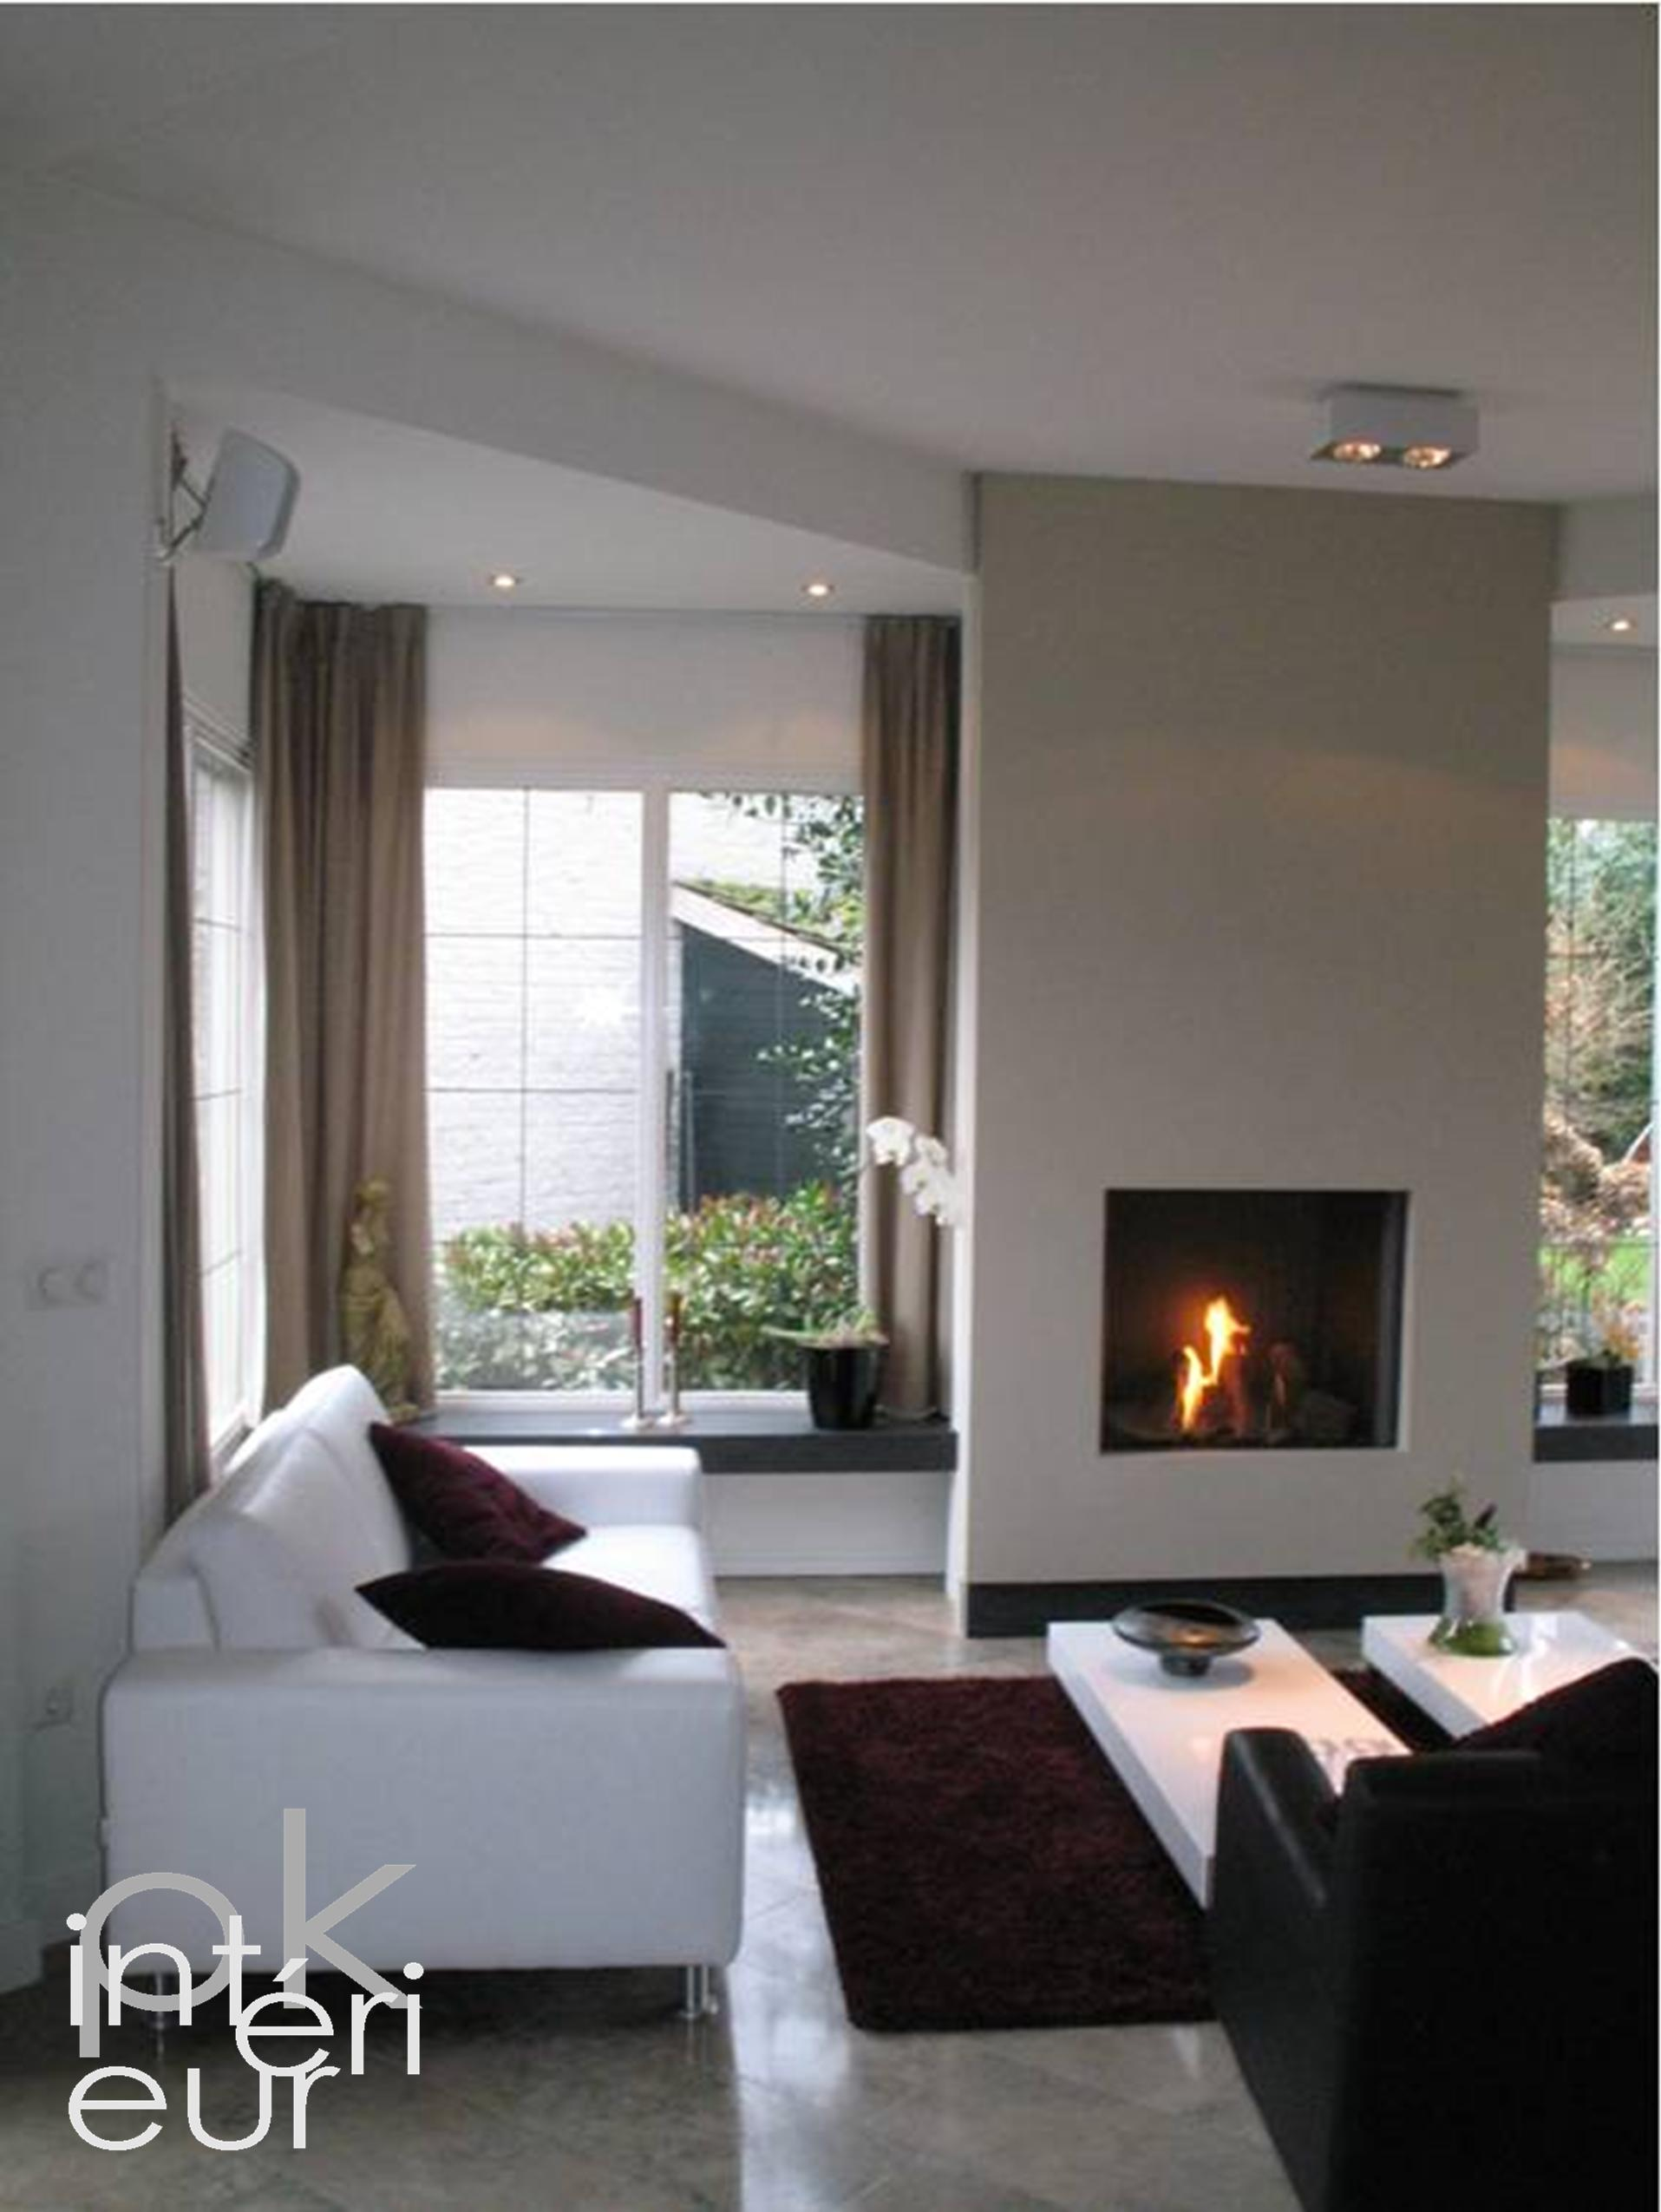 nl.funvit | interieur ideeen woonkamer fotos, Deco ideeën